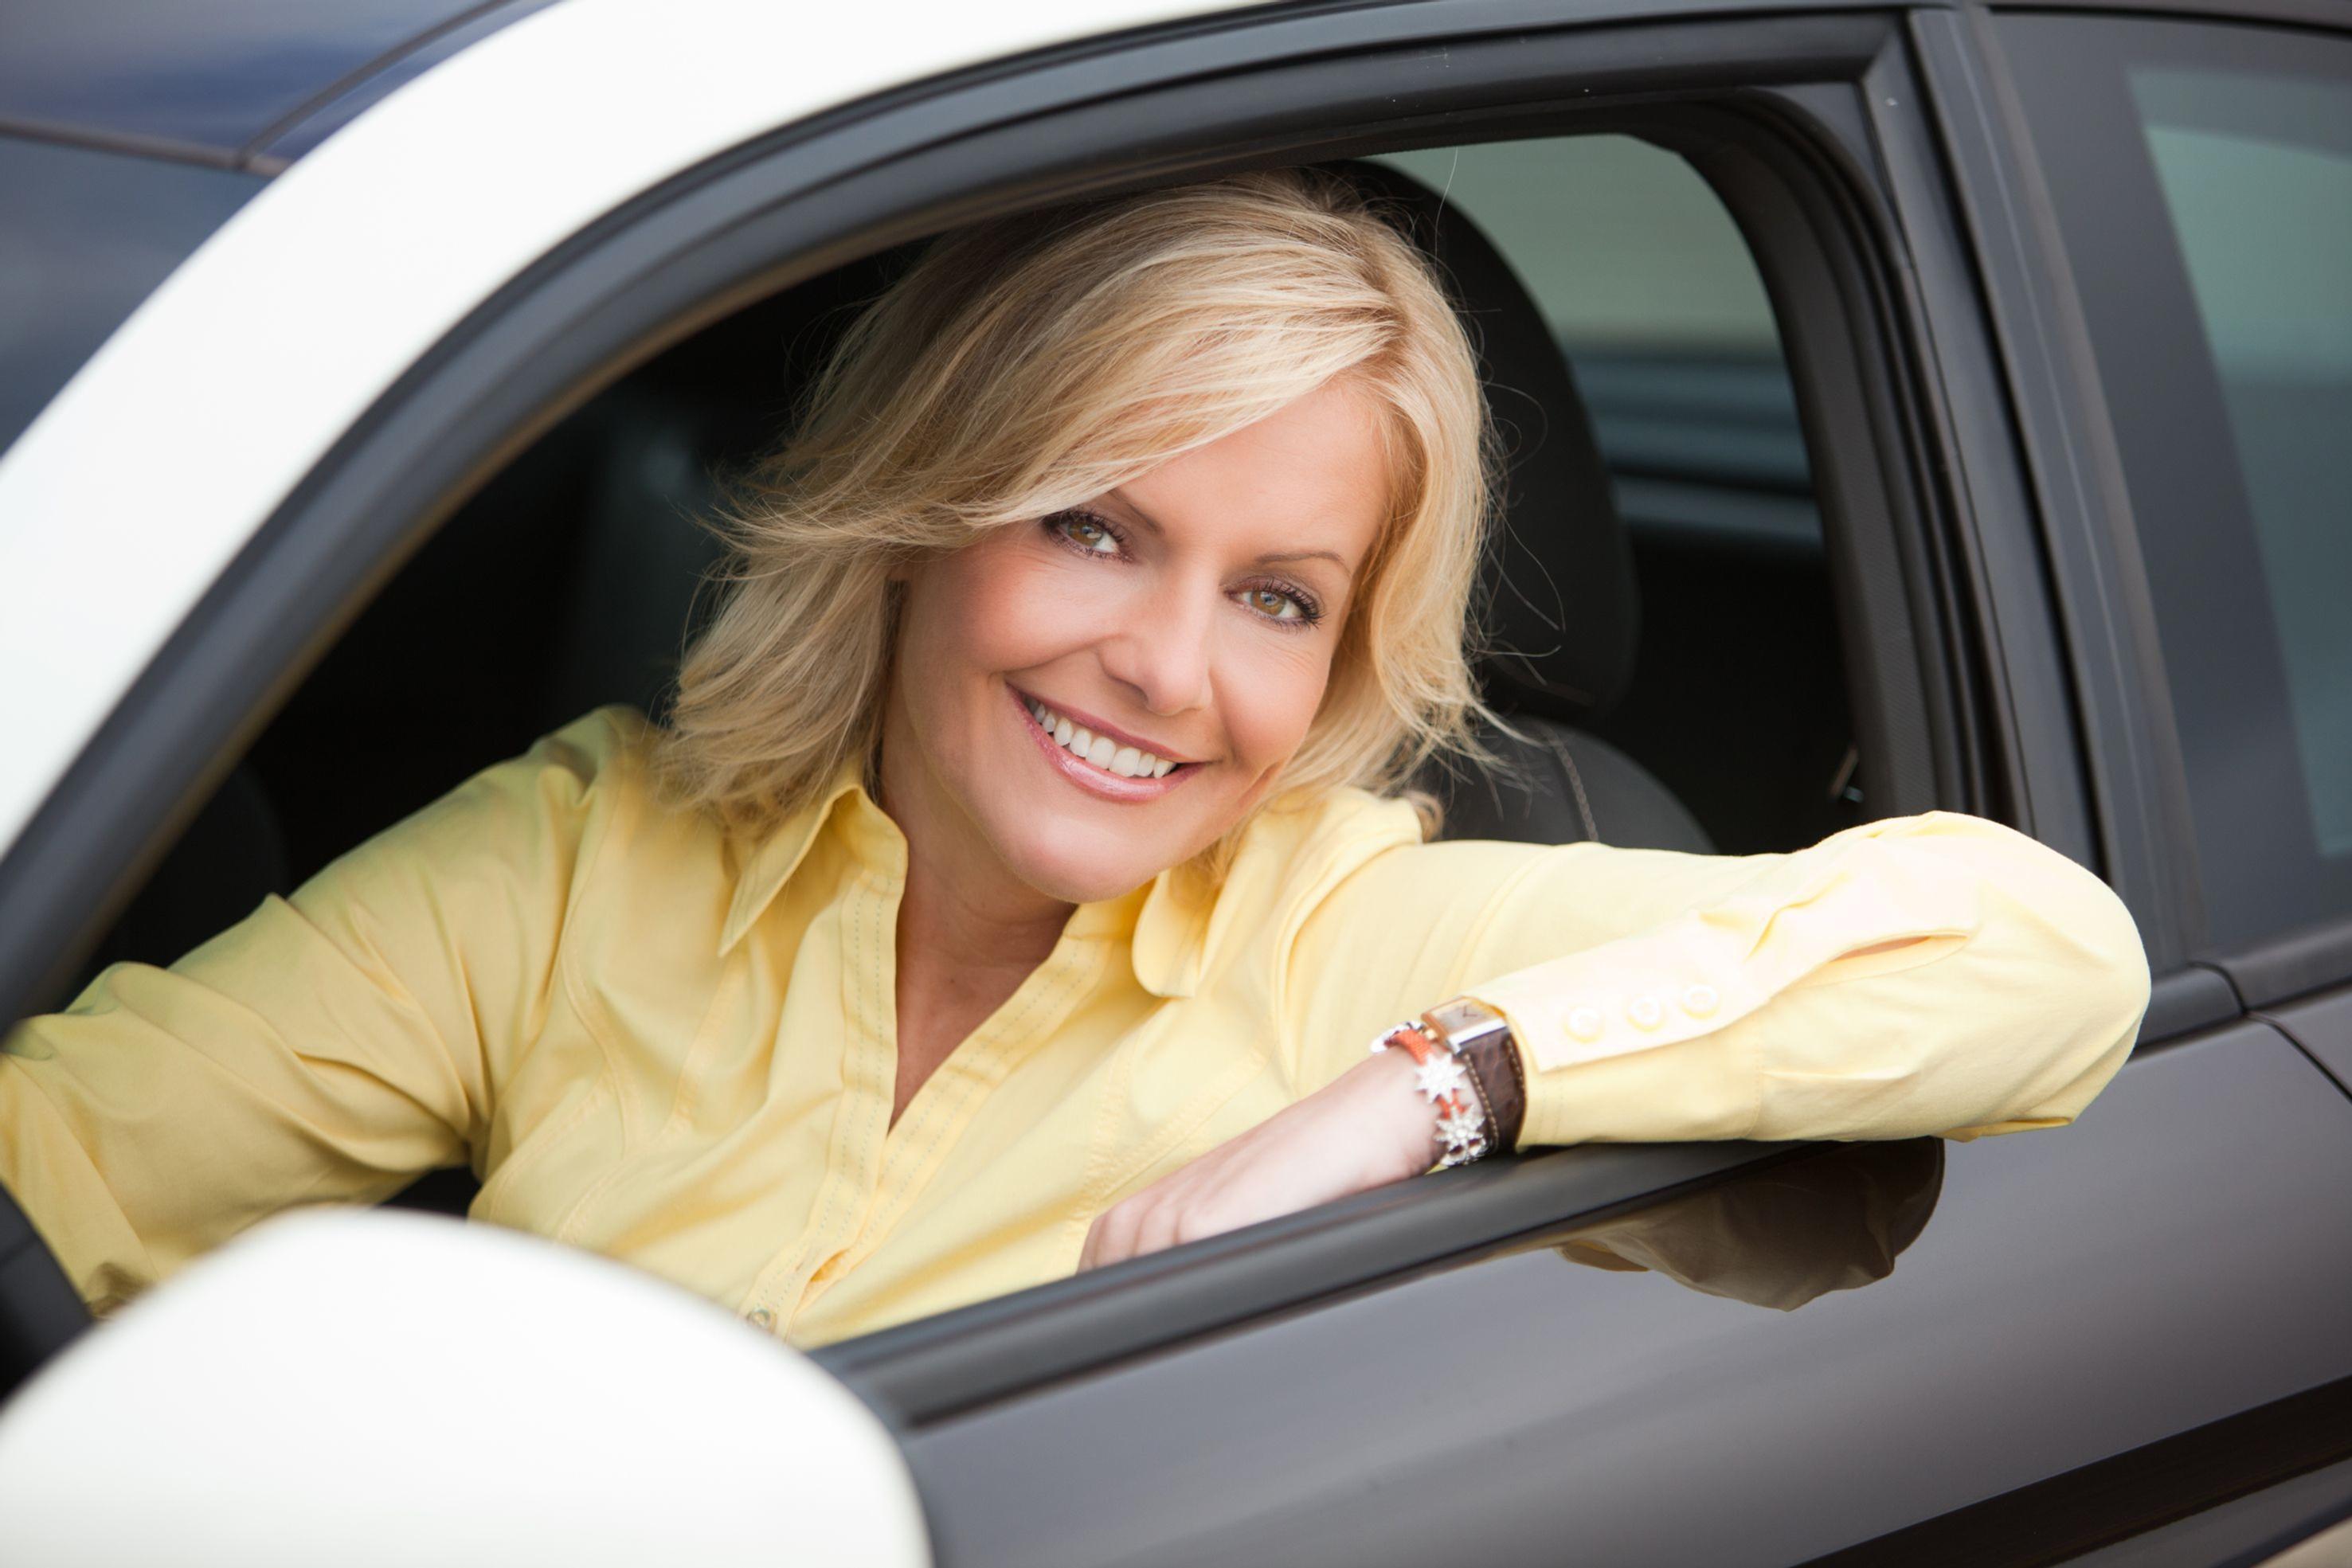 Quot Auto Mobil Quot Birte Karalus 252 Bernimmt Das Steuer Loomee Tv